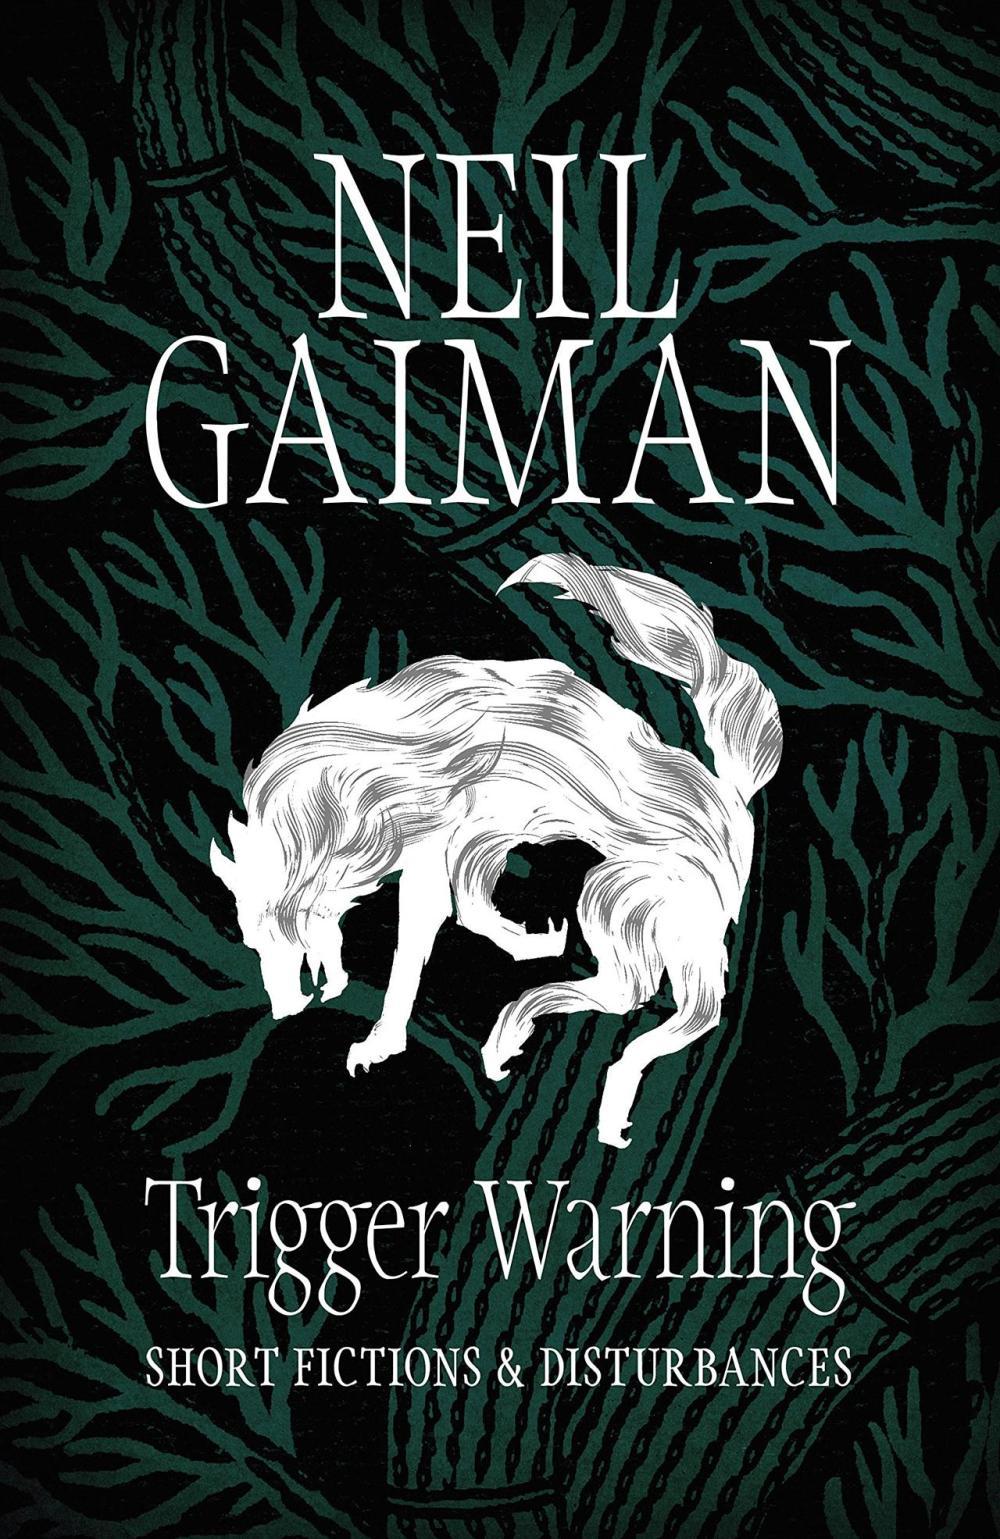 gallery_comics-neil-gaiman-trigger-warning